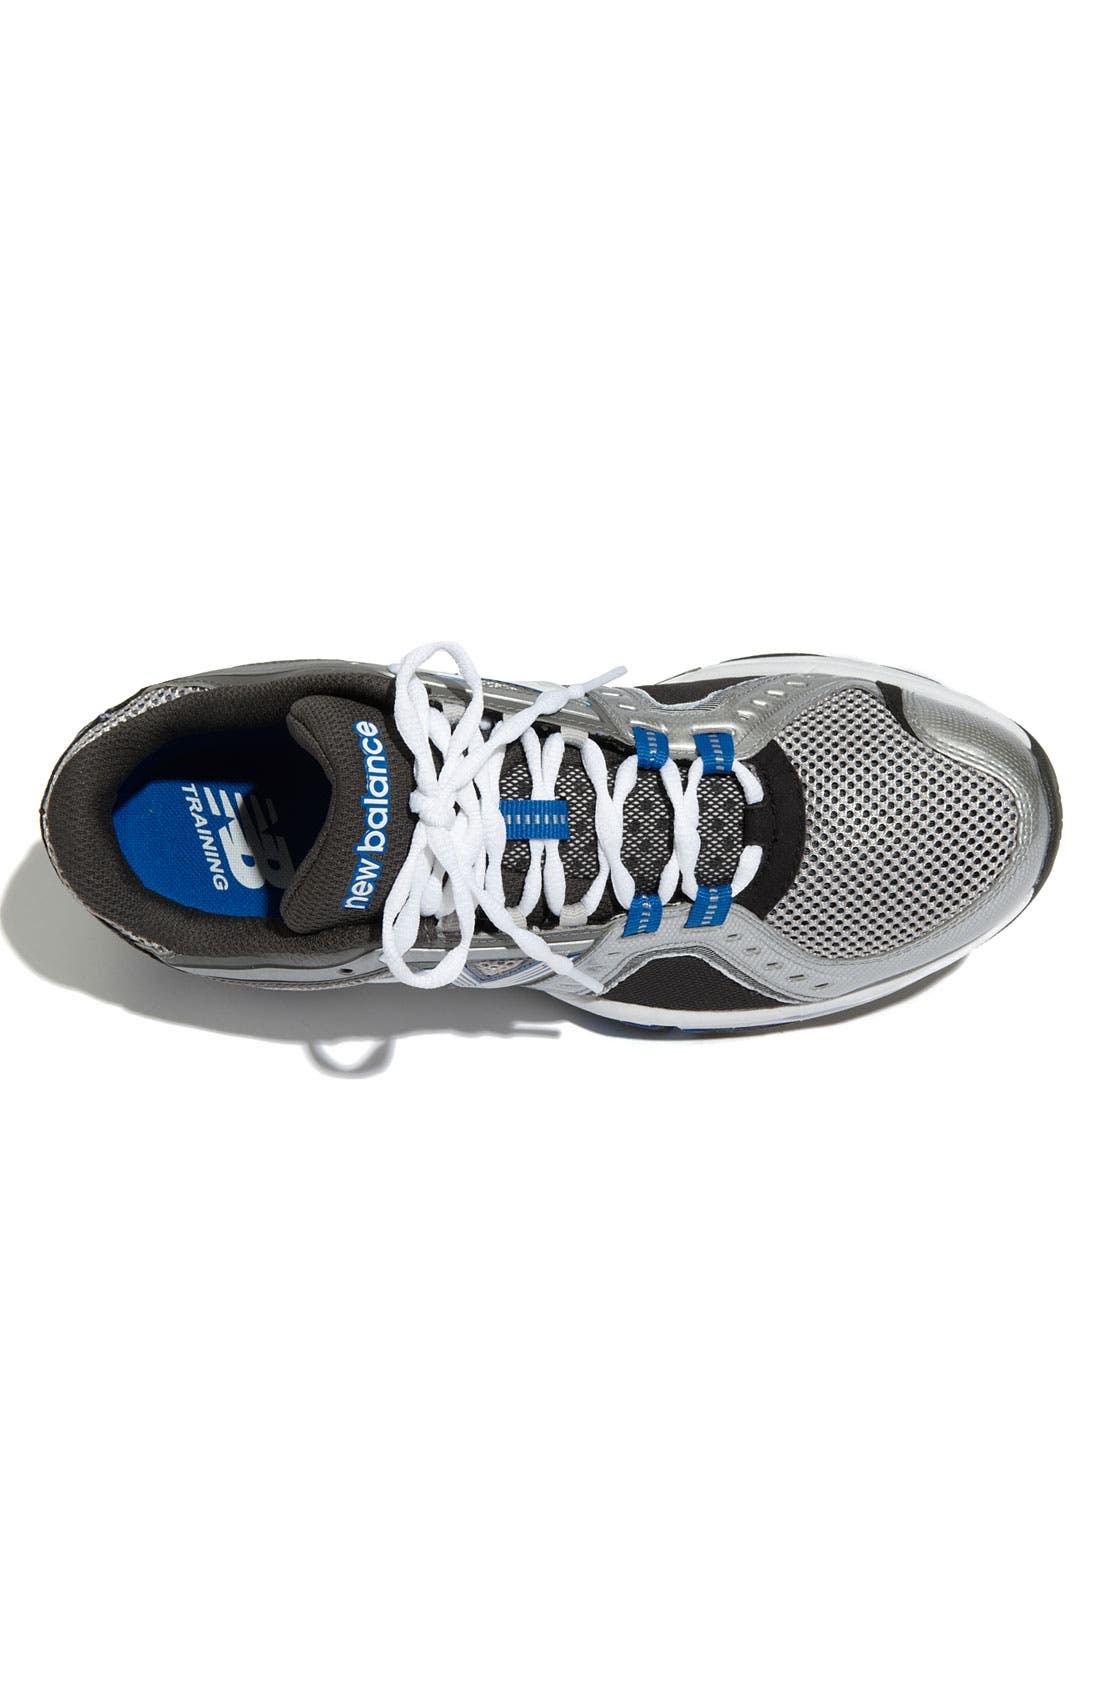 Alternate Image 3  - New Balance '1211' Training Shoe (Men) (Online Only)